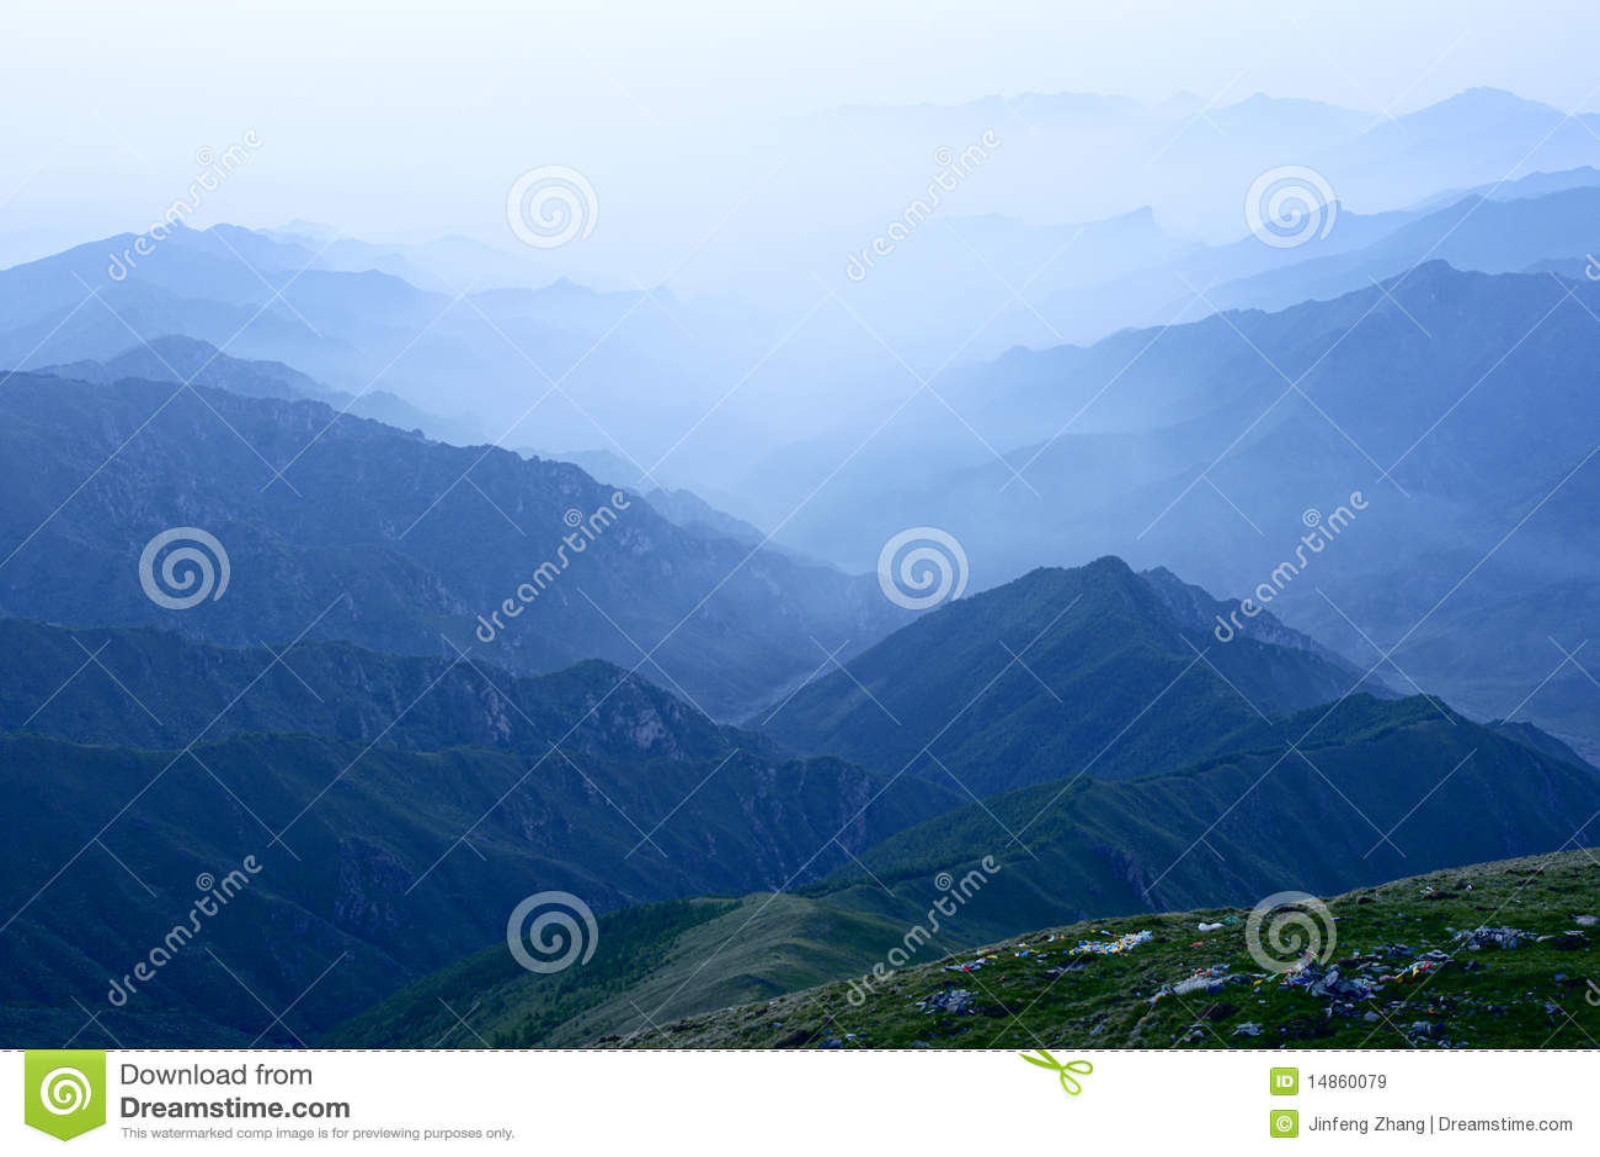 Wutai Mountain scenery